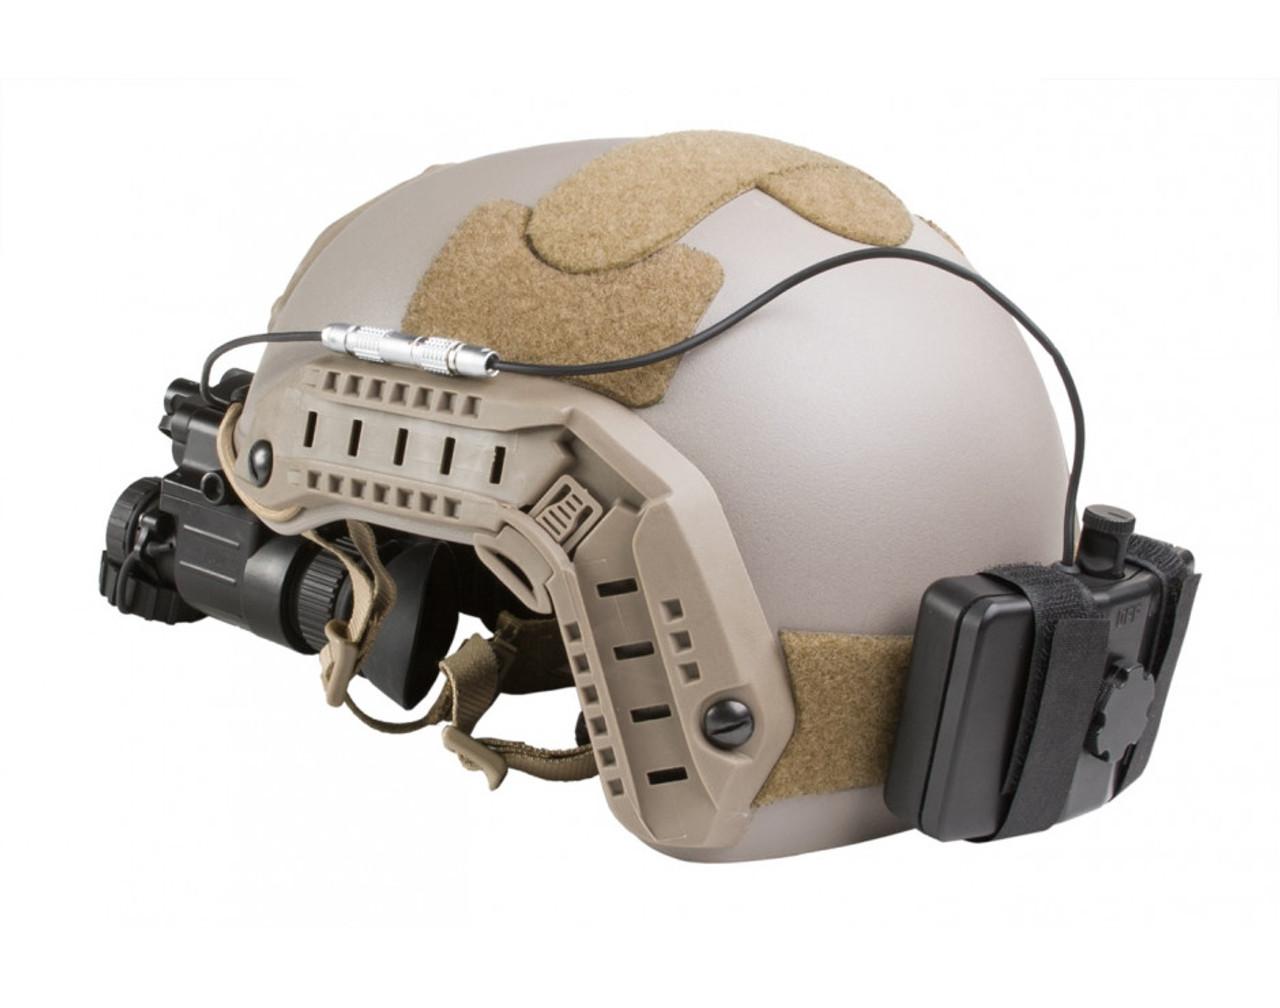 "GM NVG-50 3AW1 Dual Tube Night Vision Goggle/Binocular 51 degree FOV Gen 3+ Auto-Gated ""White Phosphor Level 1"" (AGM NVG-50 3AW1)"